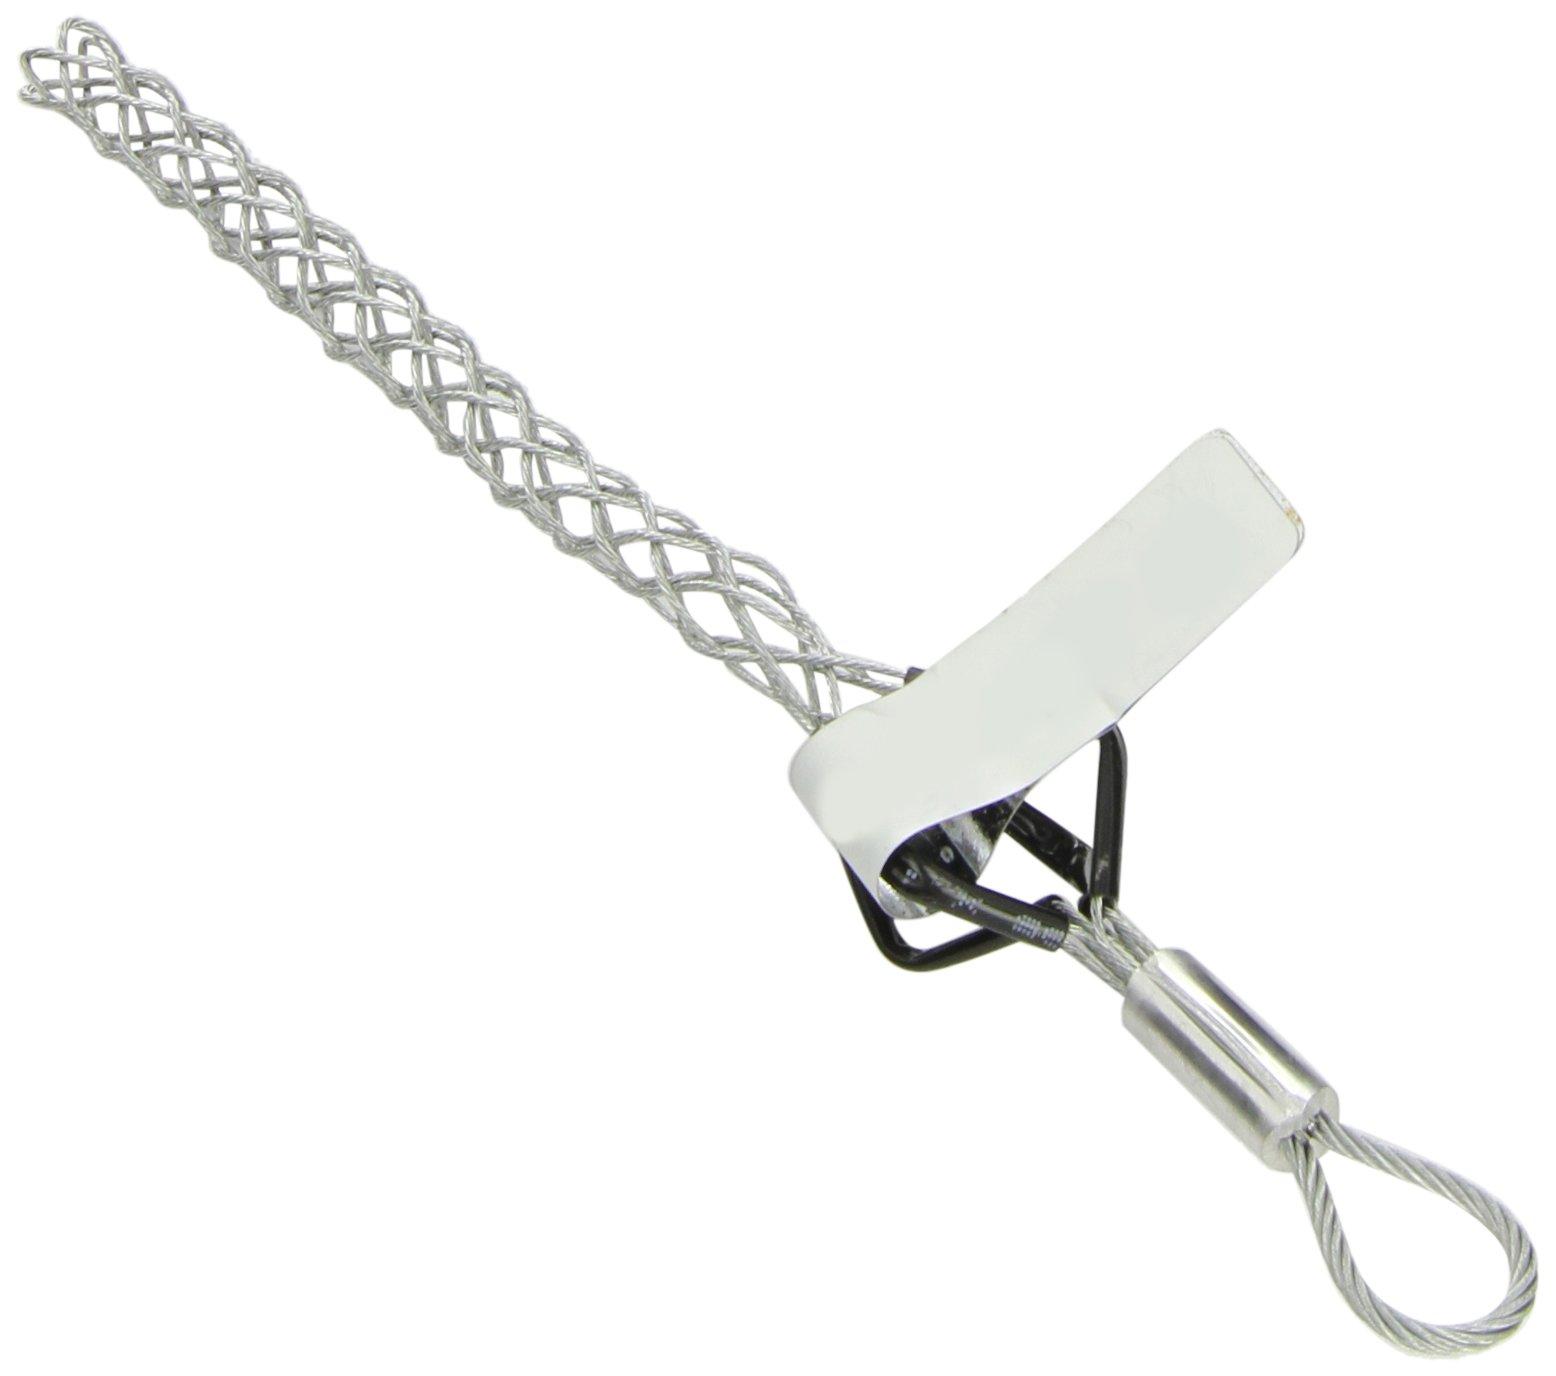 Woodhead 35970 Pulling Grip, Junior Duty, Flexible Eye, 1700lb Approximate Break Strength, 5.00'' Mesh Length, .25–.36'' Cable Diameter